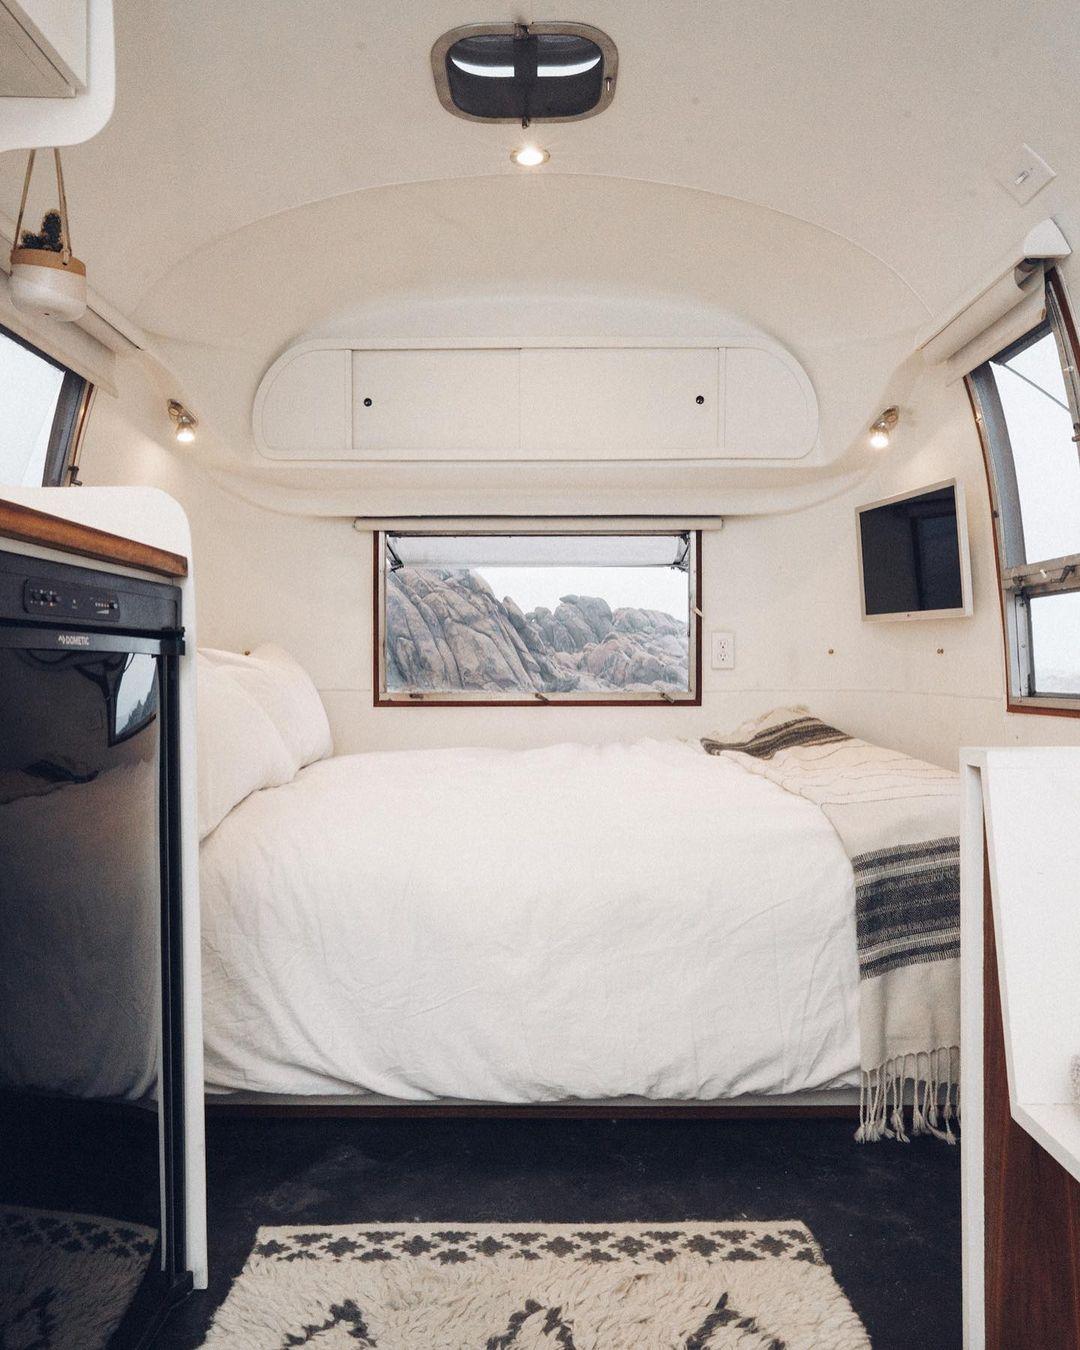 Airstream trailer Haus 21 - Interior designer turned heirloom Airstream into delightful home